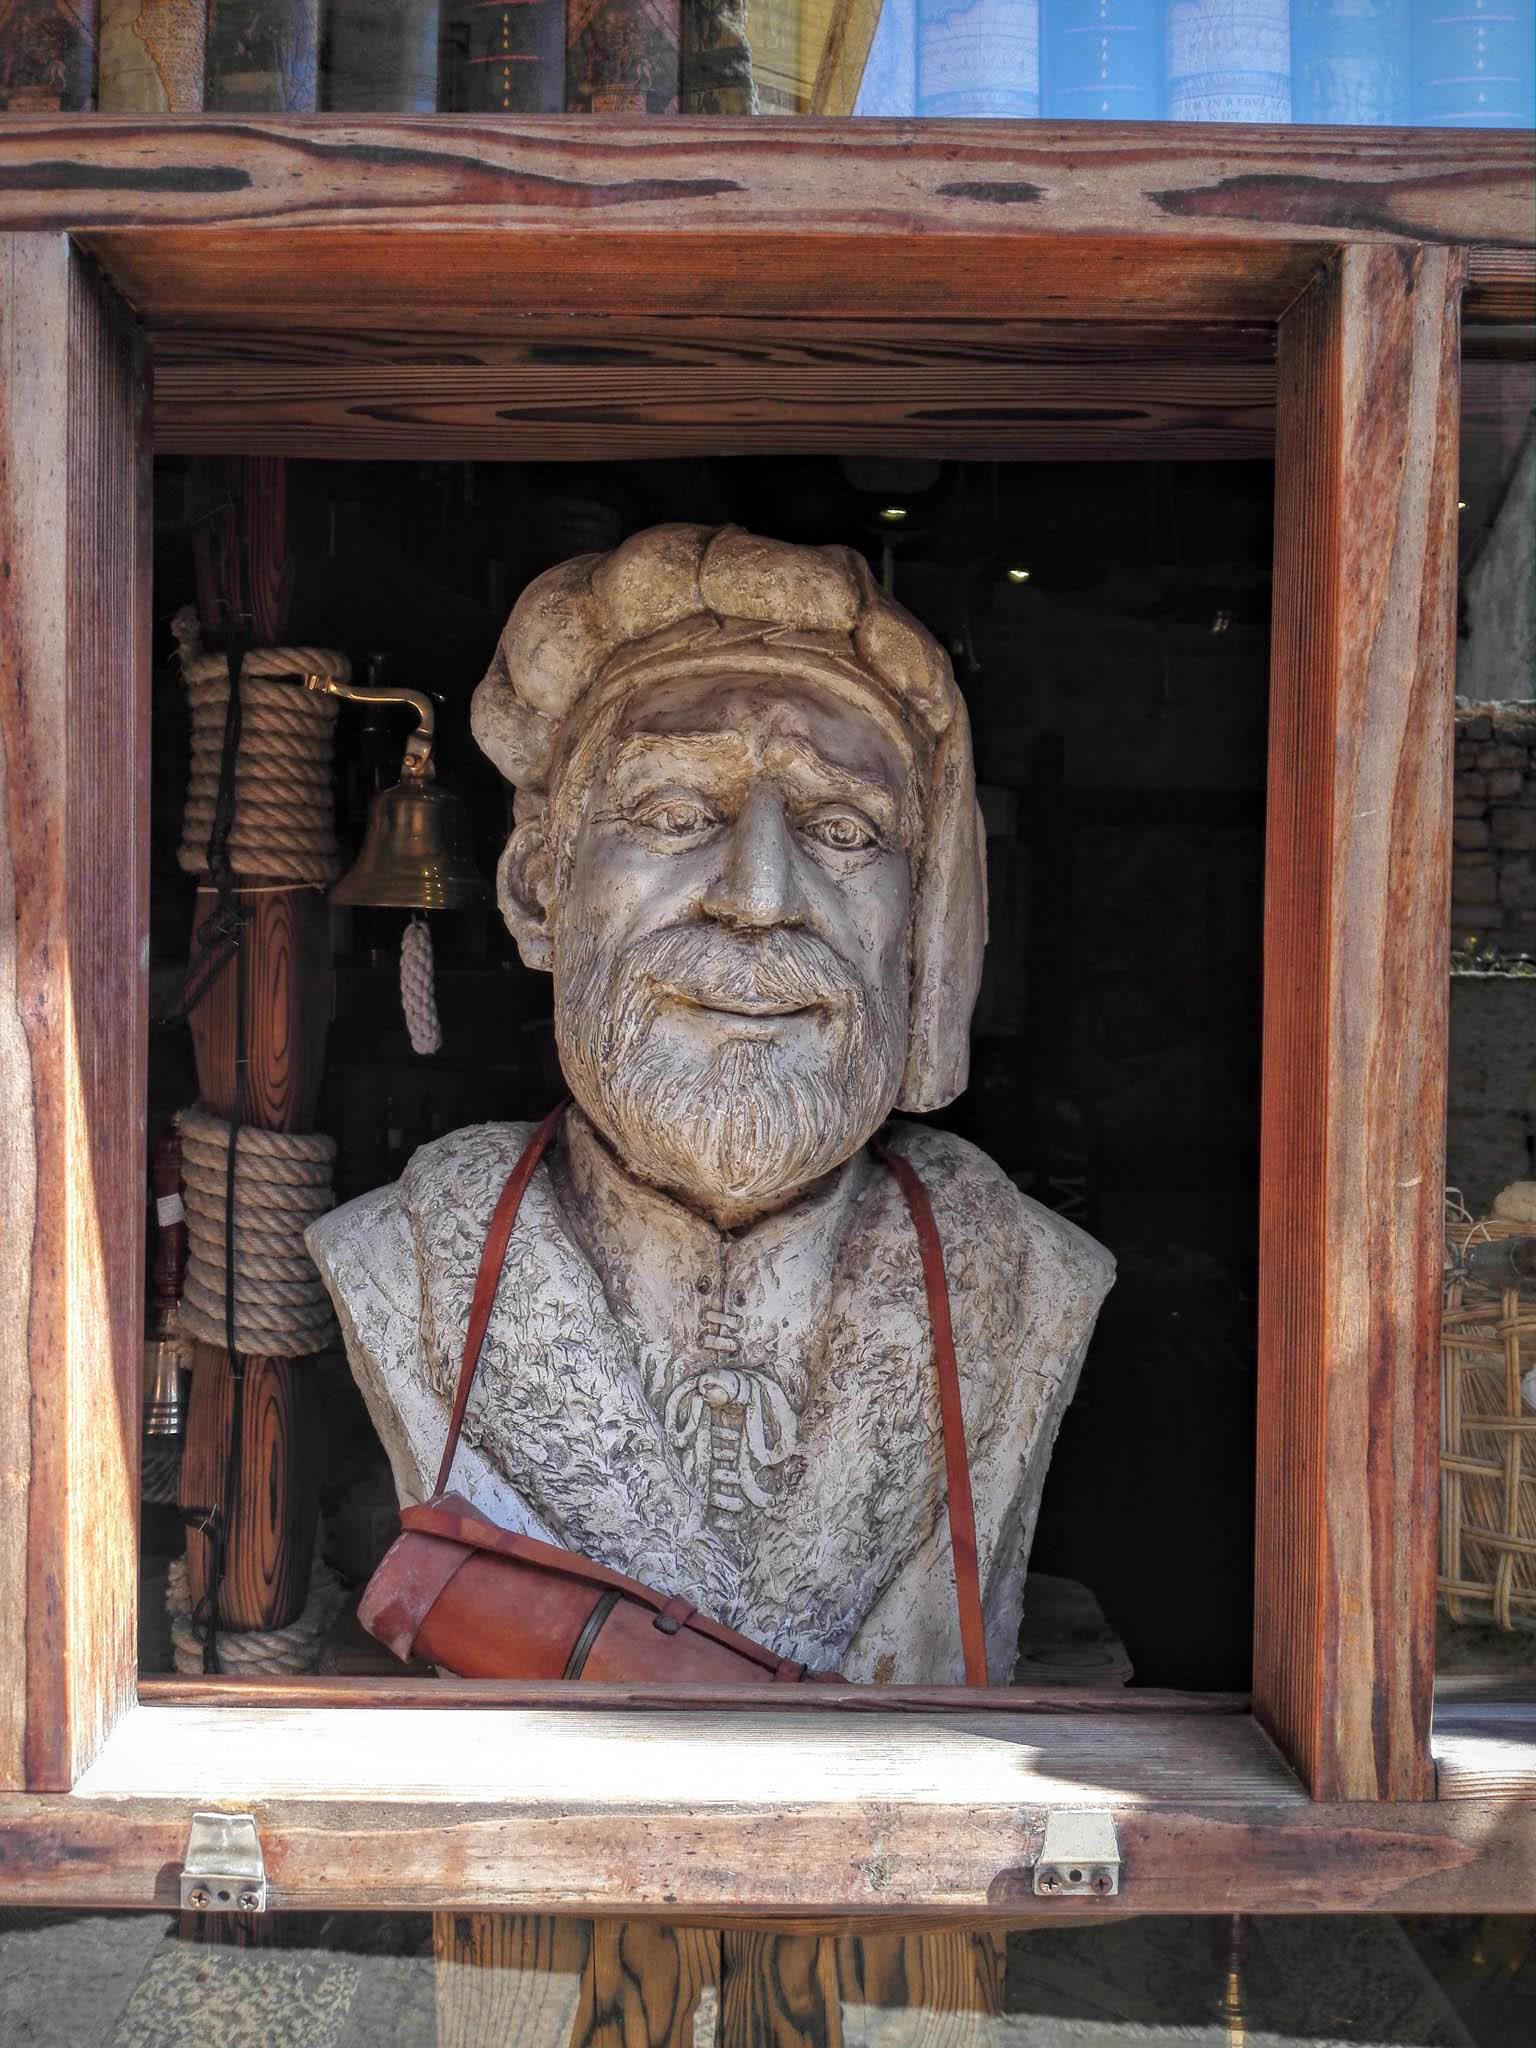 Korkula, Marco Polo's Birthplace